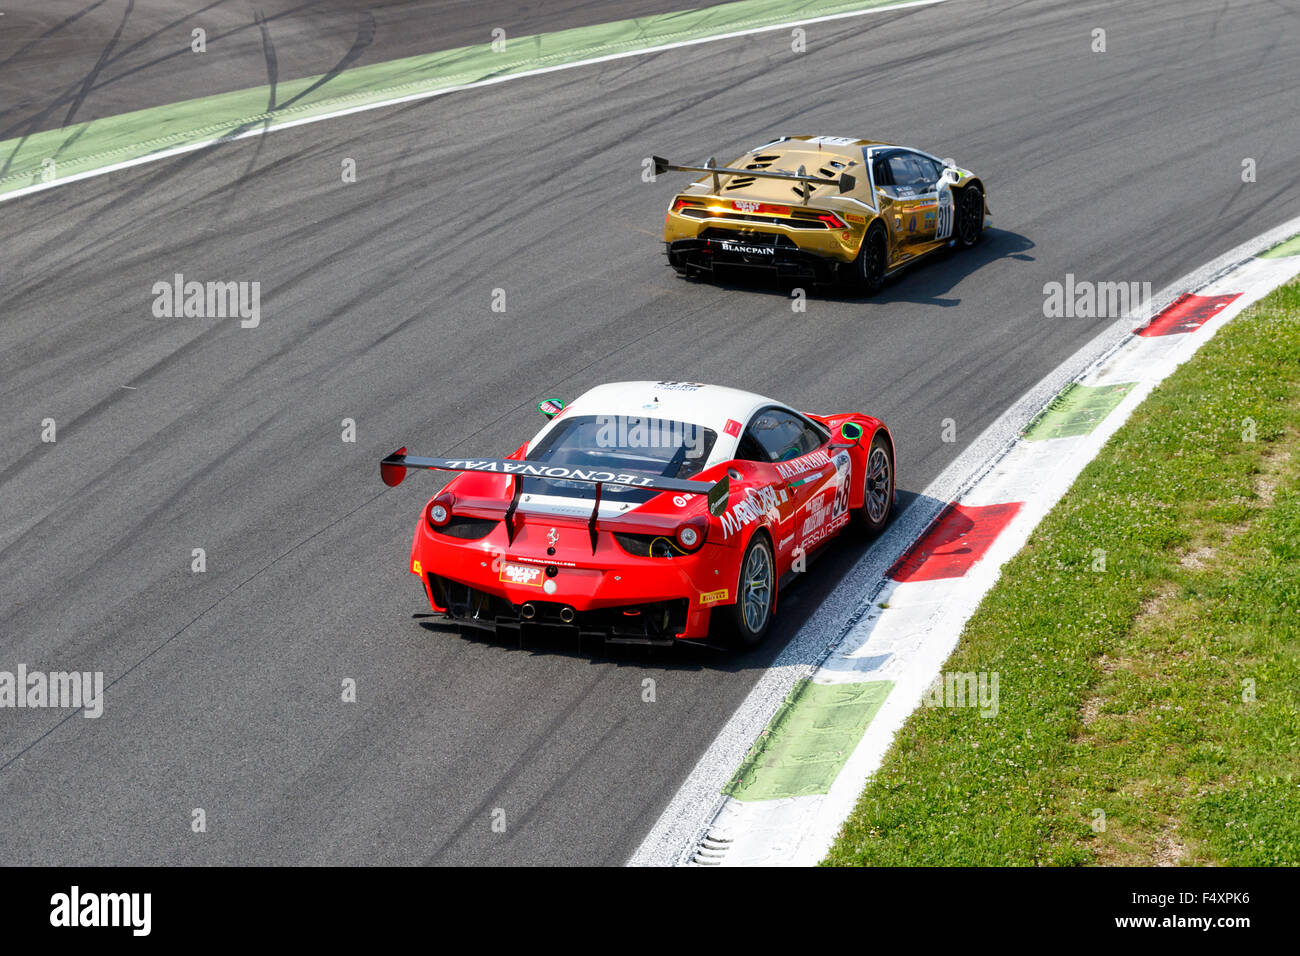 Circuit Monza Italia : Monza italy may ferrari italia of malucelli team